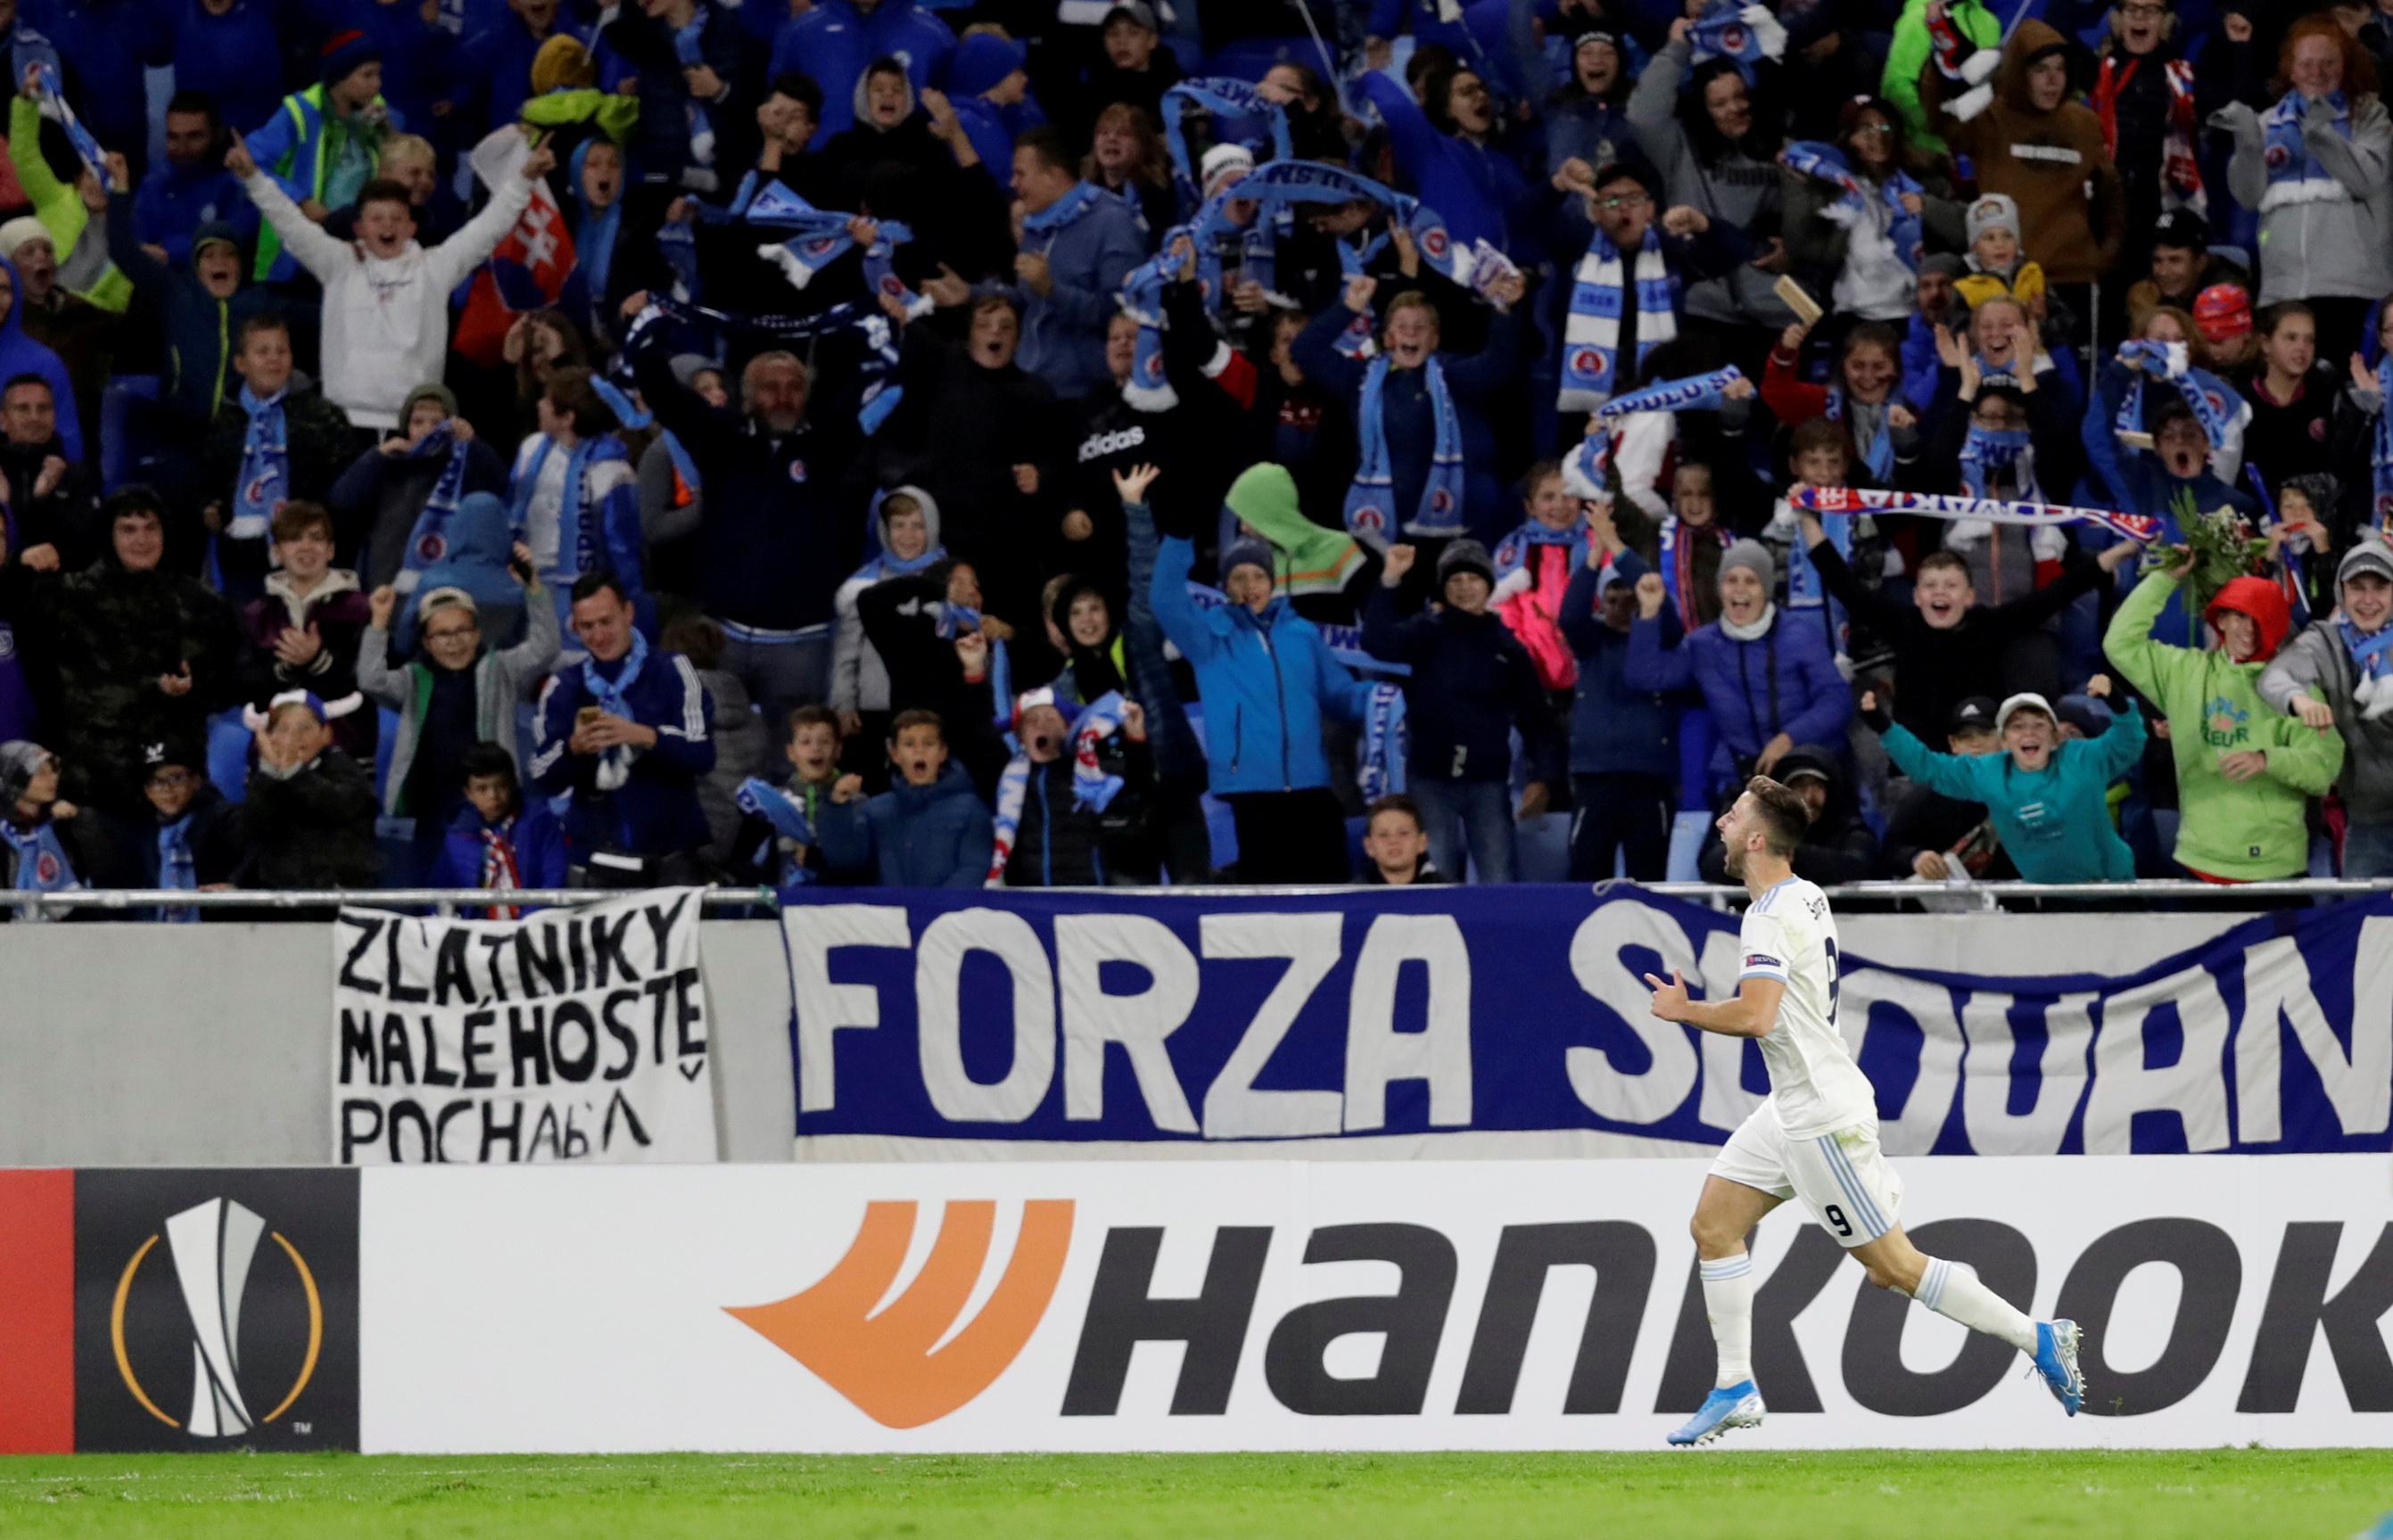 Bratislava v Wolves to be played behind closed doors - UEFA